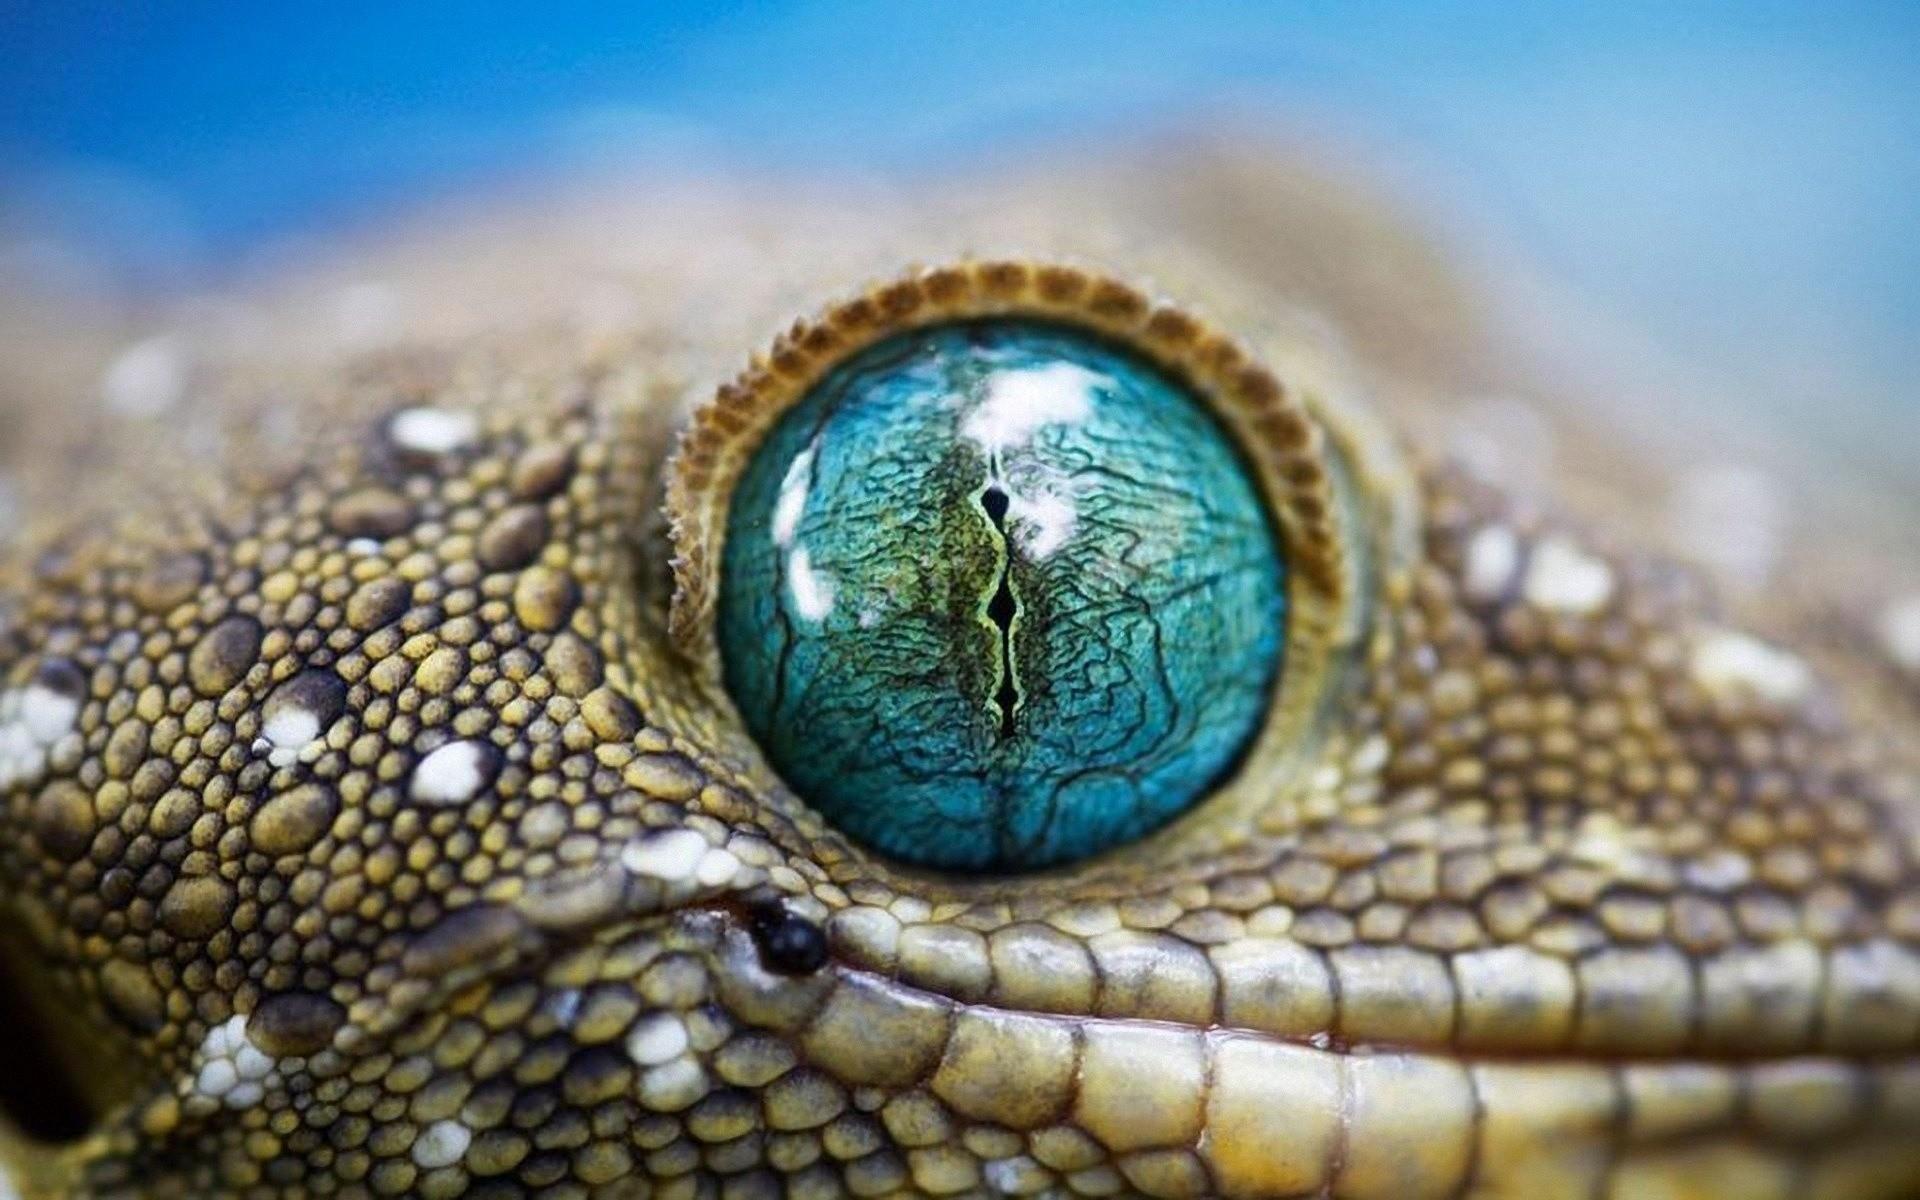 Res: 1920x1200, Leather, Snake, Eyes, Macro